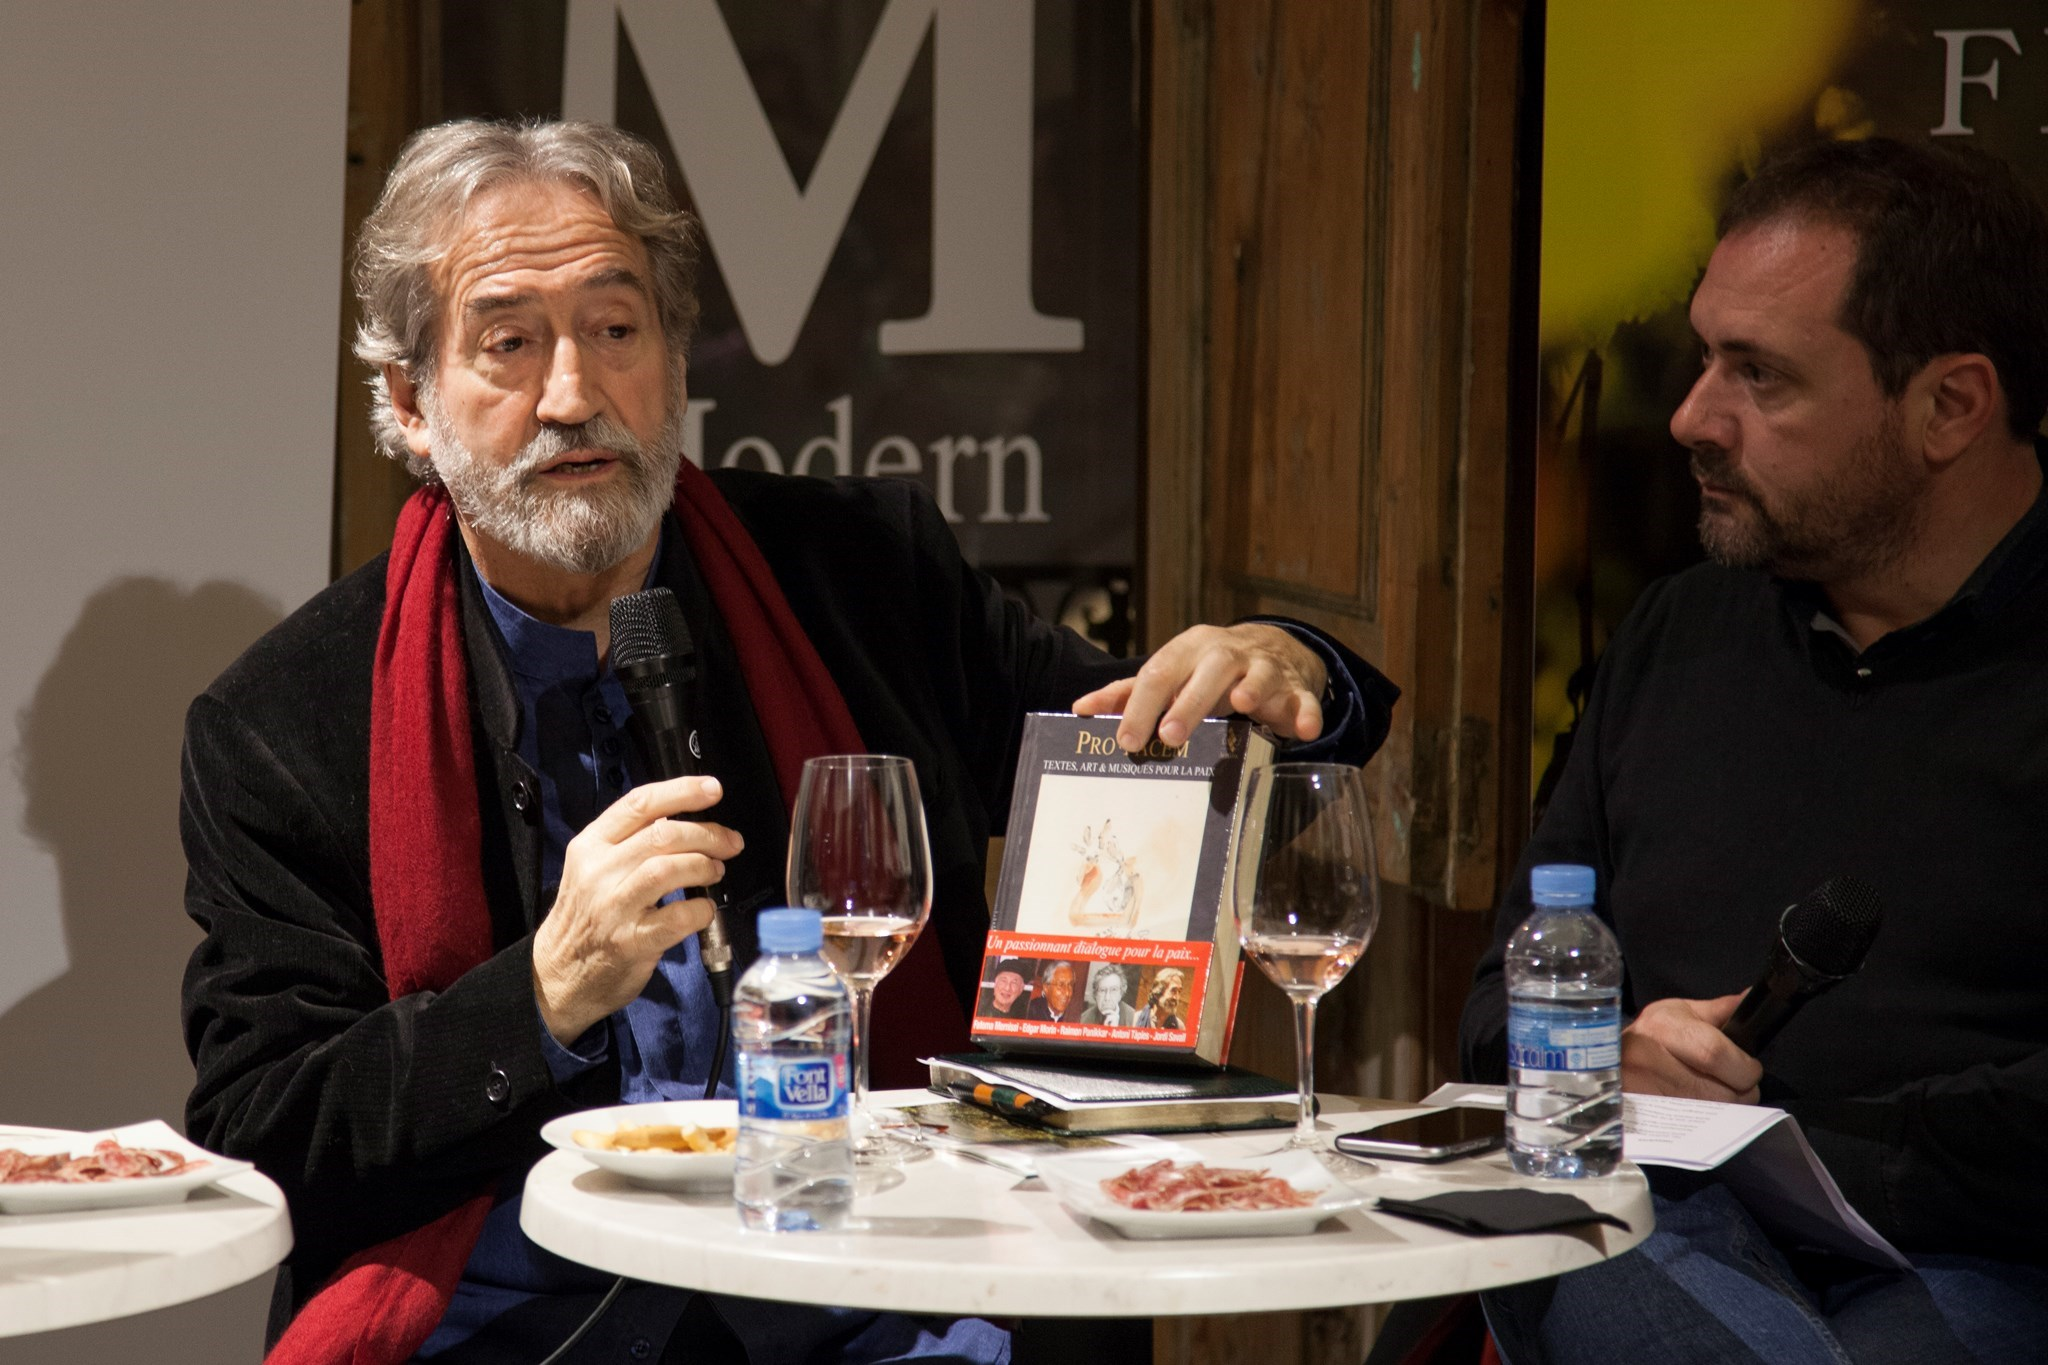 #VisàVis amb Jordi Savall i el celler Domènech Vidal